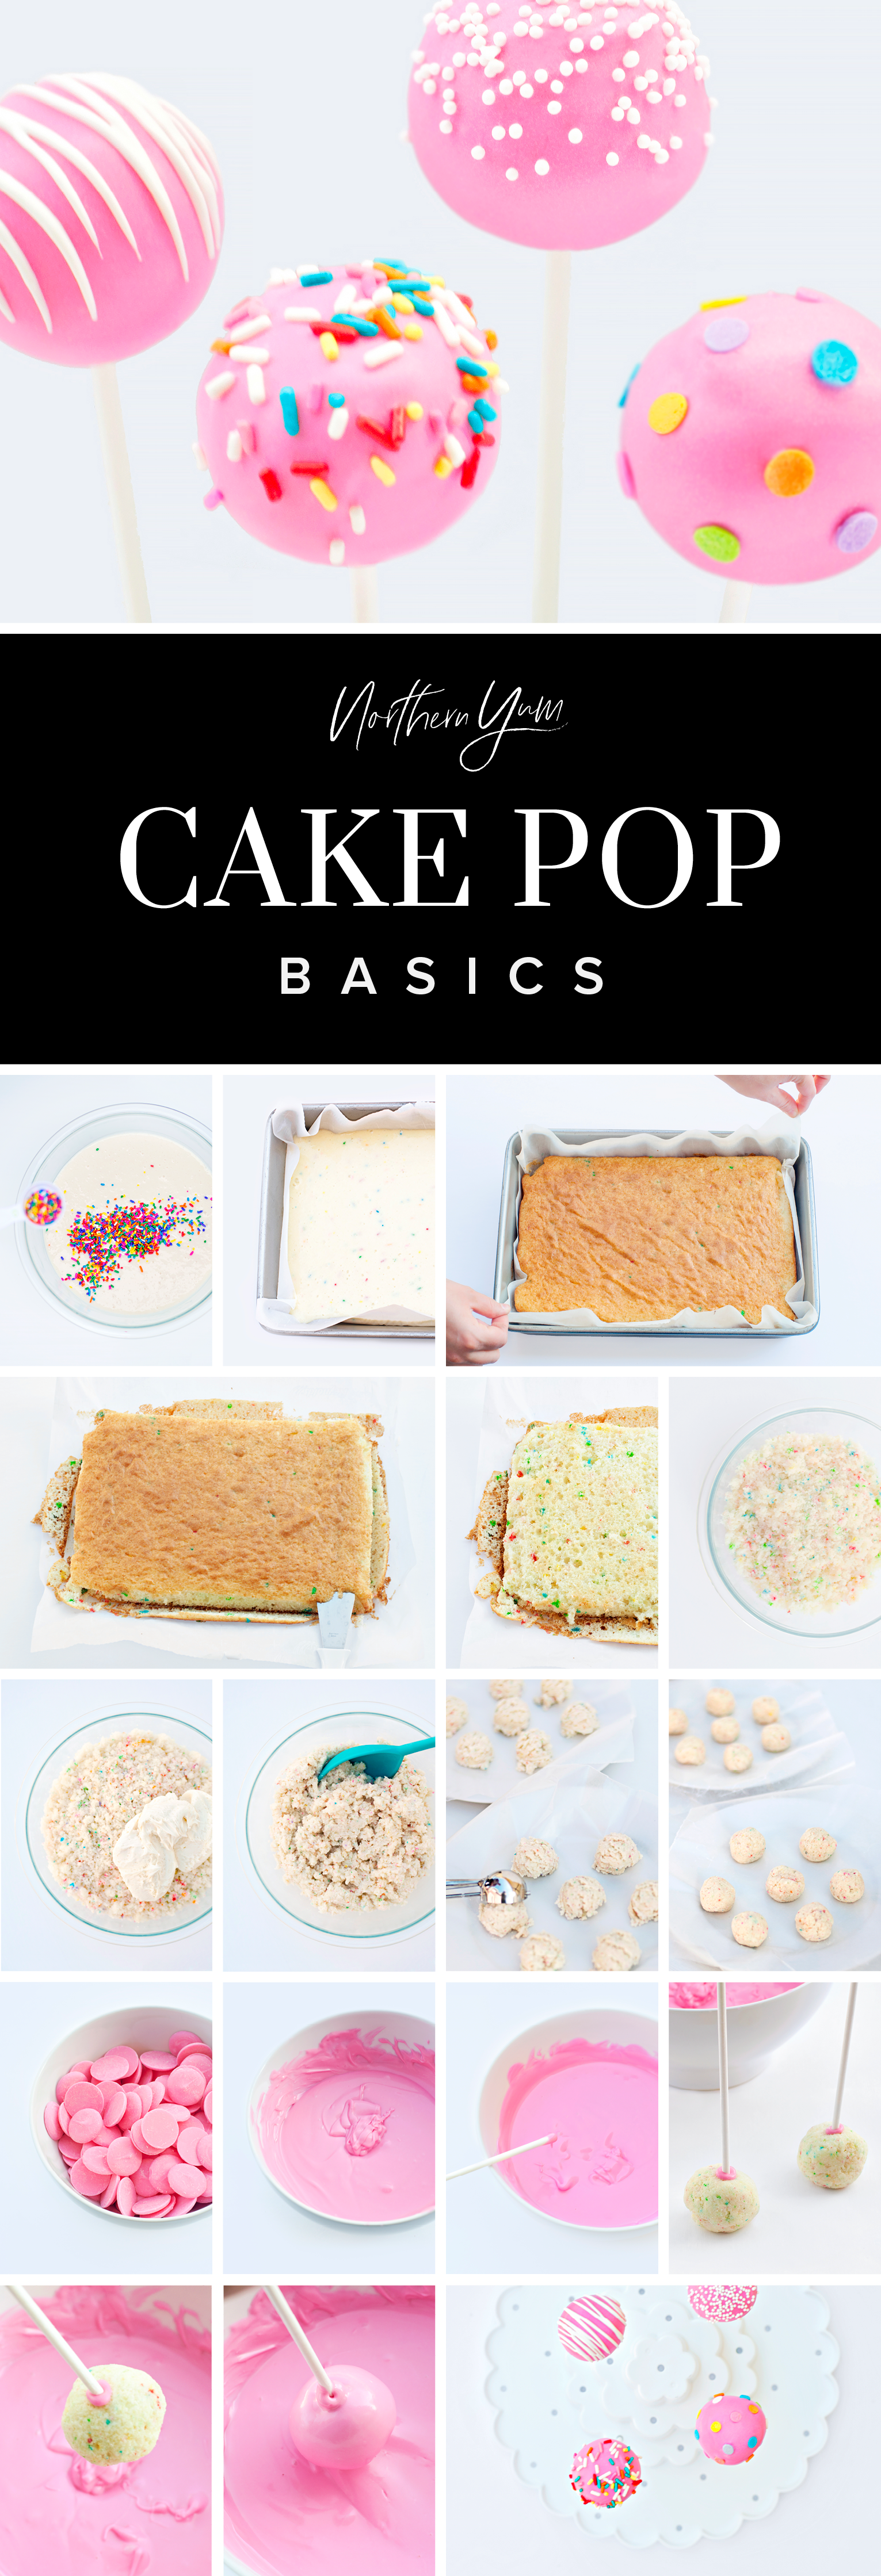 Cake-Pop-Basics-Pinterest1